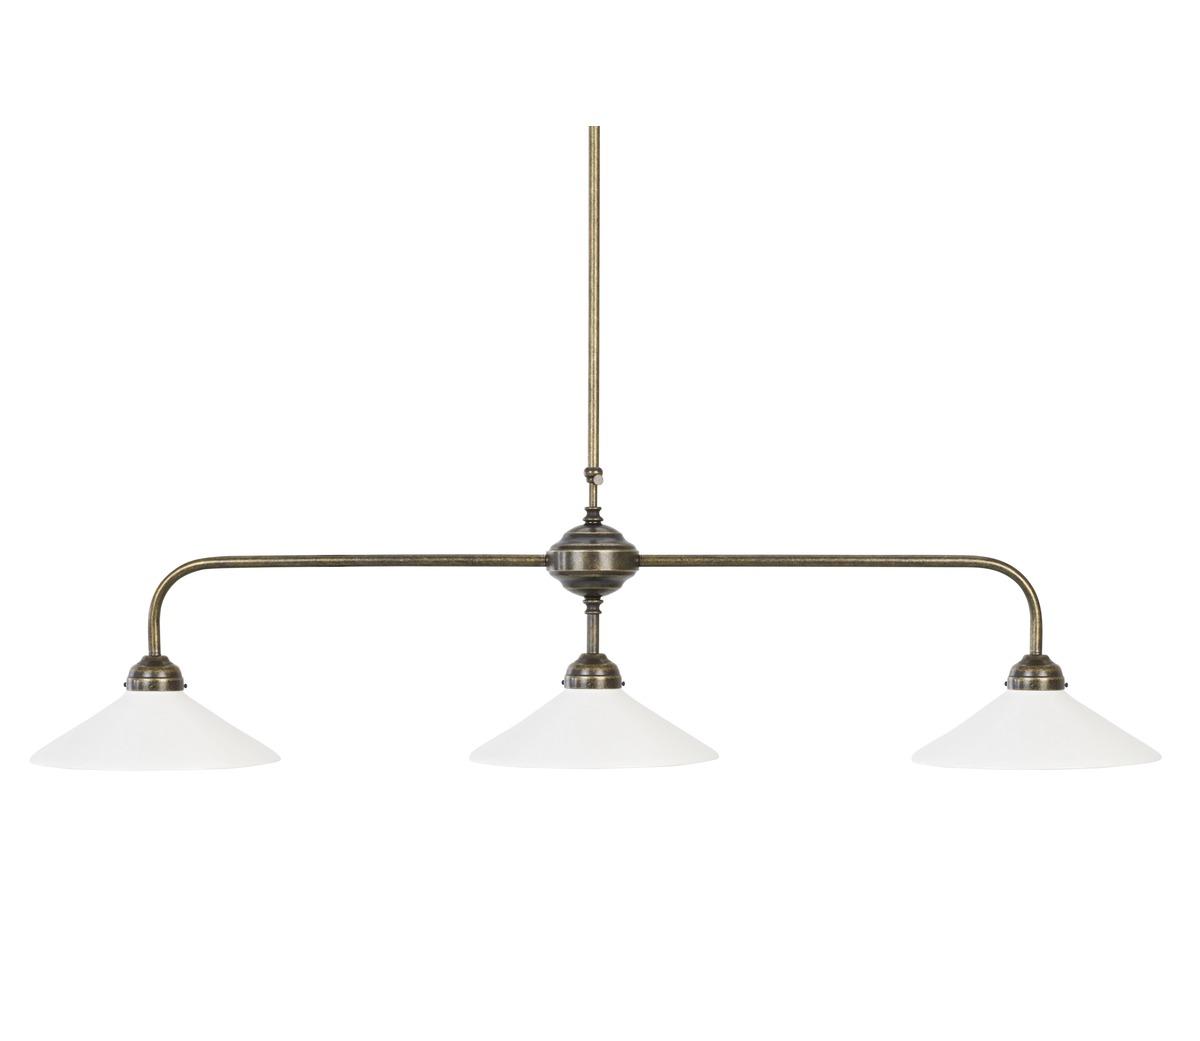 french house lighting. Billiard Lamp Triple French House Lighting